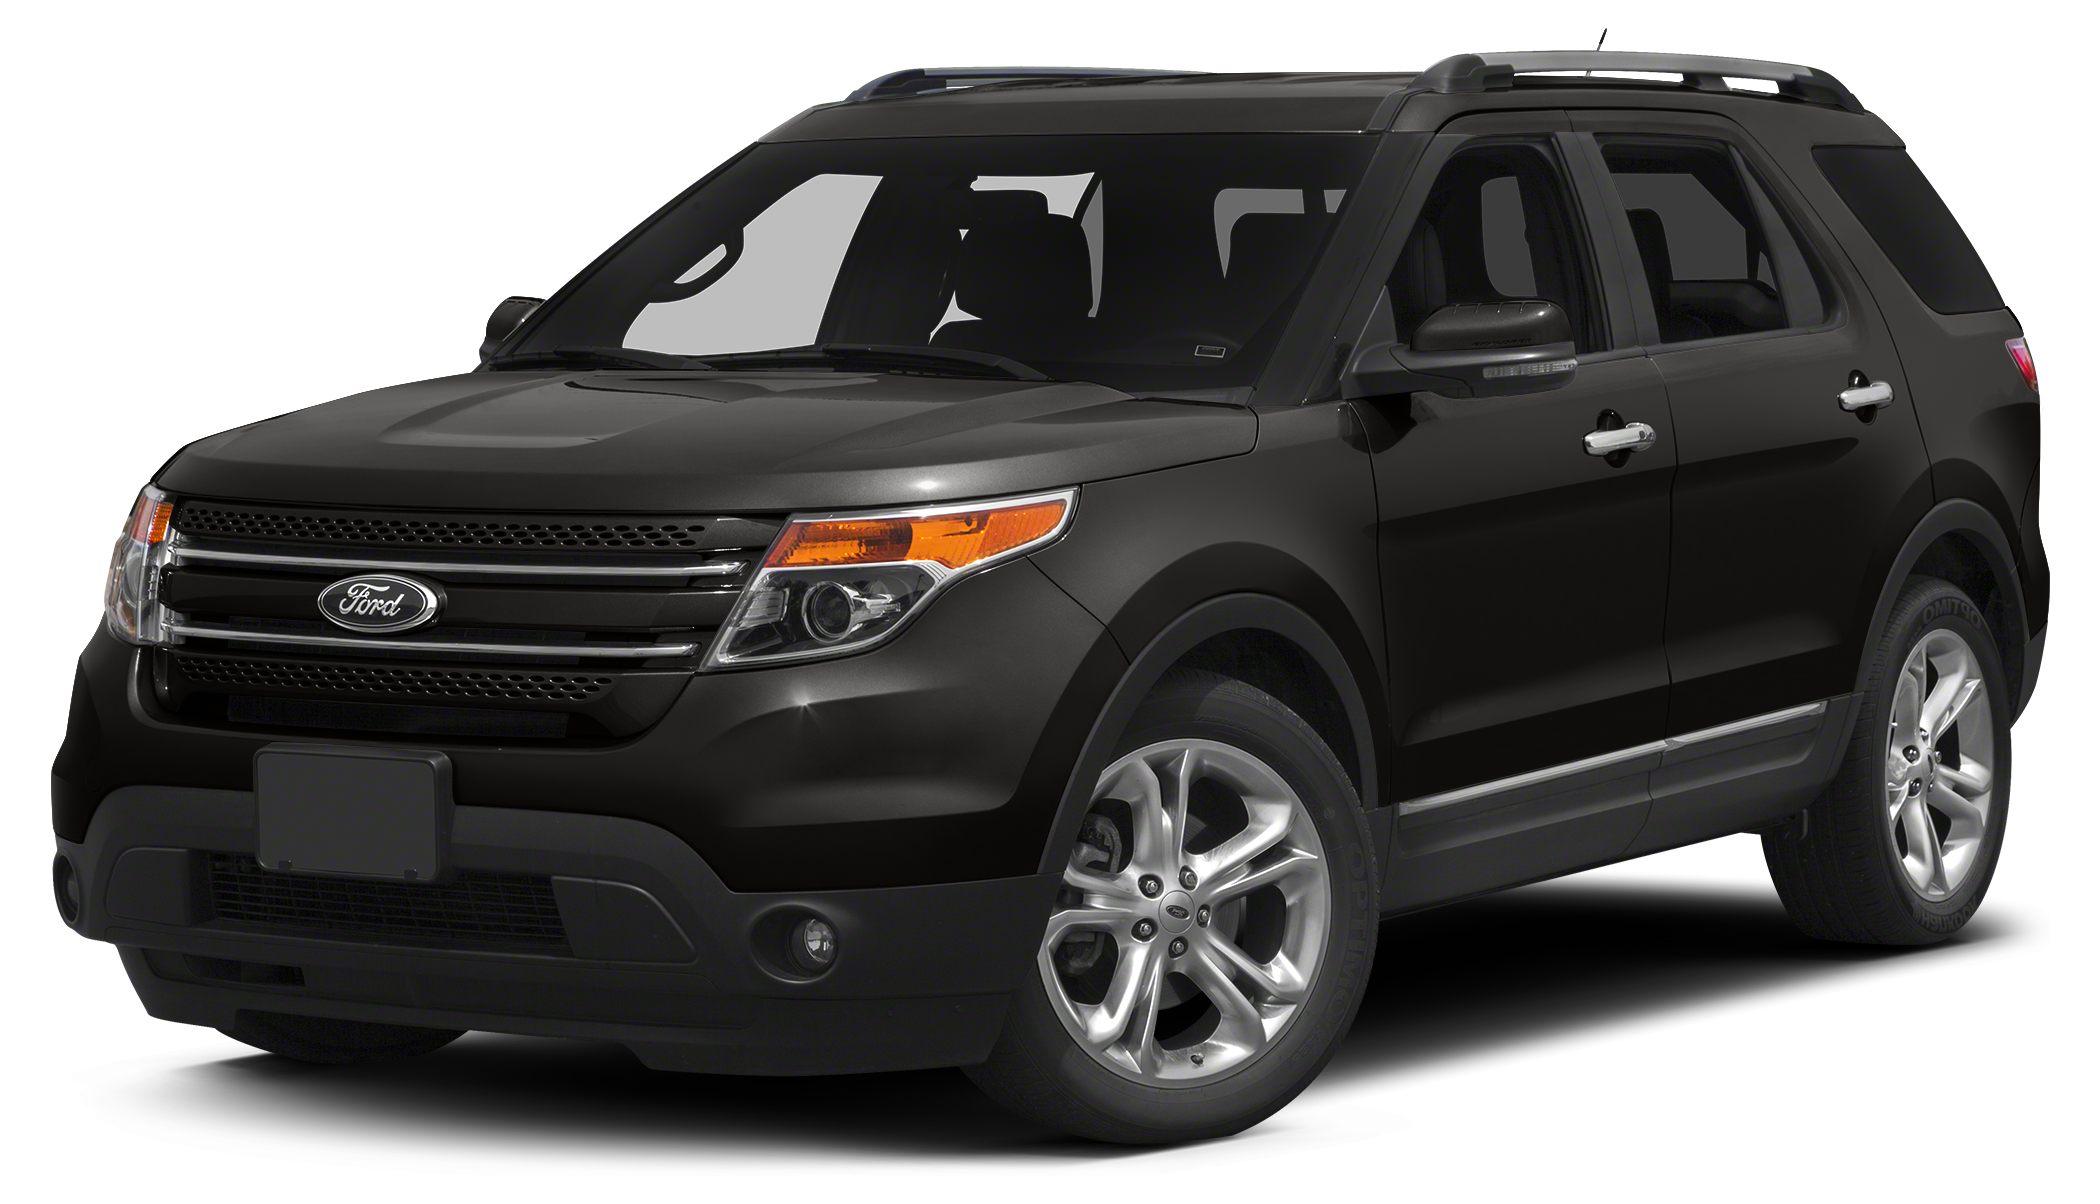 2013 Ford Explorer Limited Miles 70Color Kodiak Brown Metallic Stock DGB12321 VIN 1FM5K7F99D